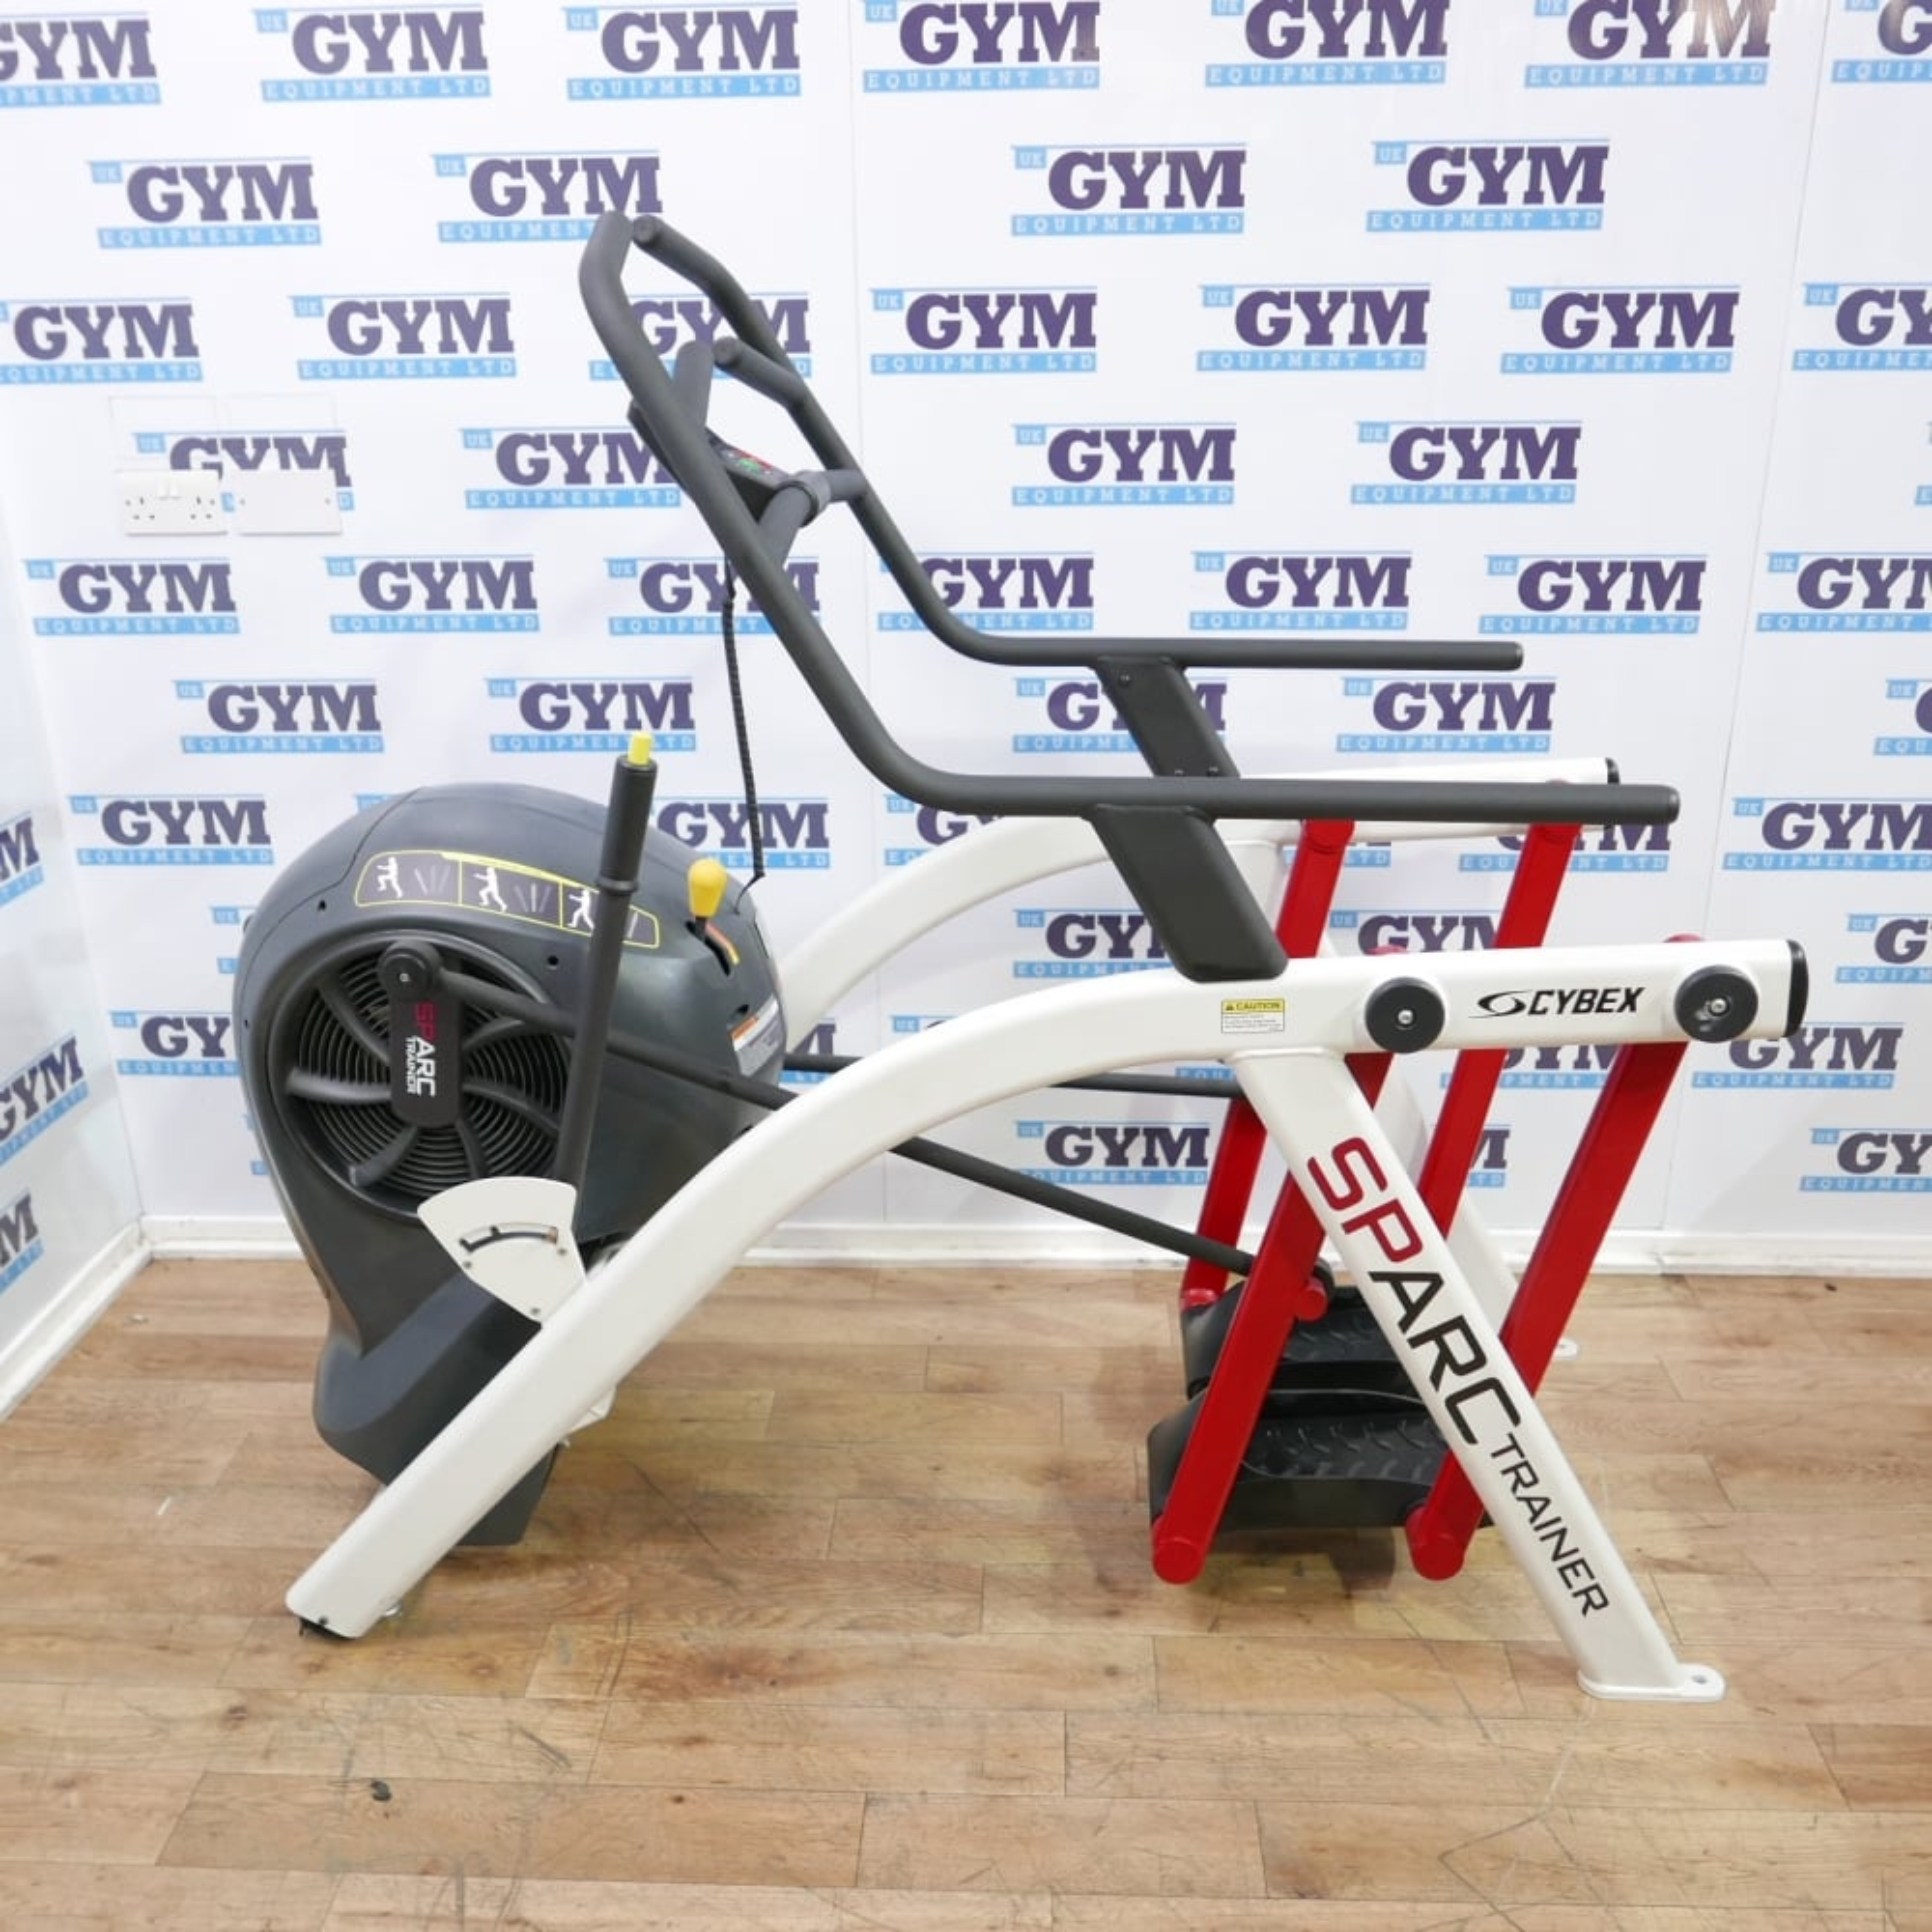 Cybex Treadmill Parts Uk: Cardio Machines From UK Gym